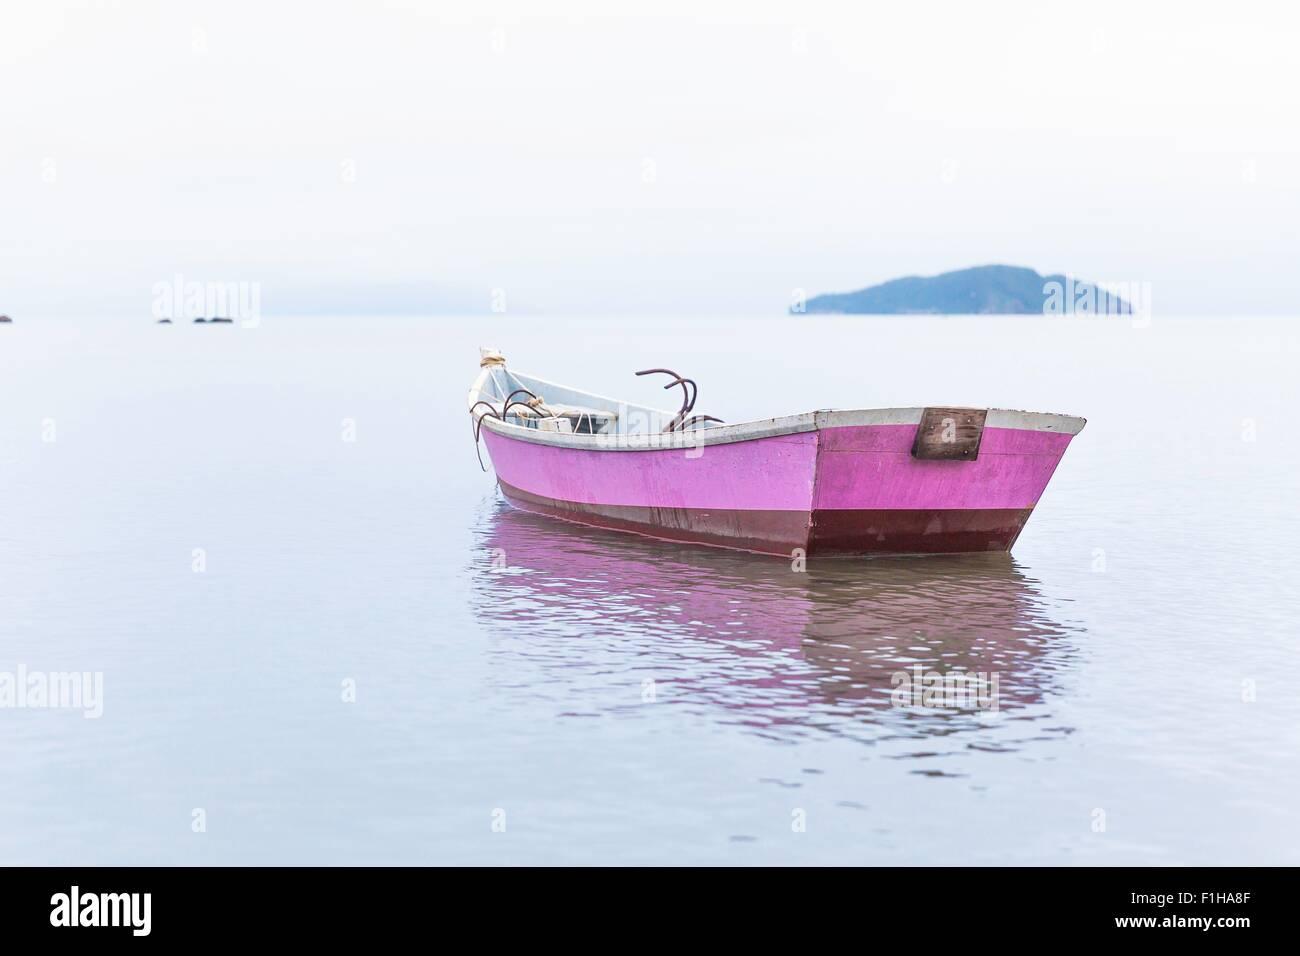 Anchored pink rowing boat, Manguinhos, Buzios, Rio de Janeiro, Brazil - Stock Image